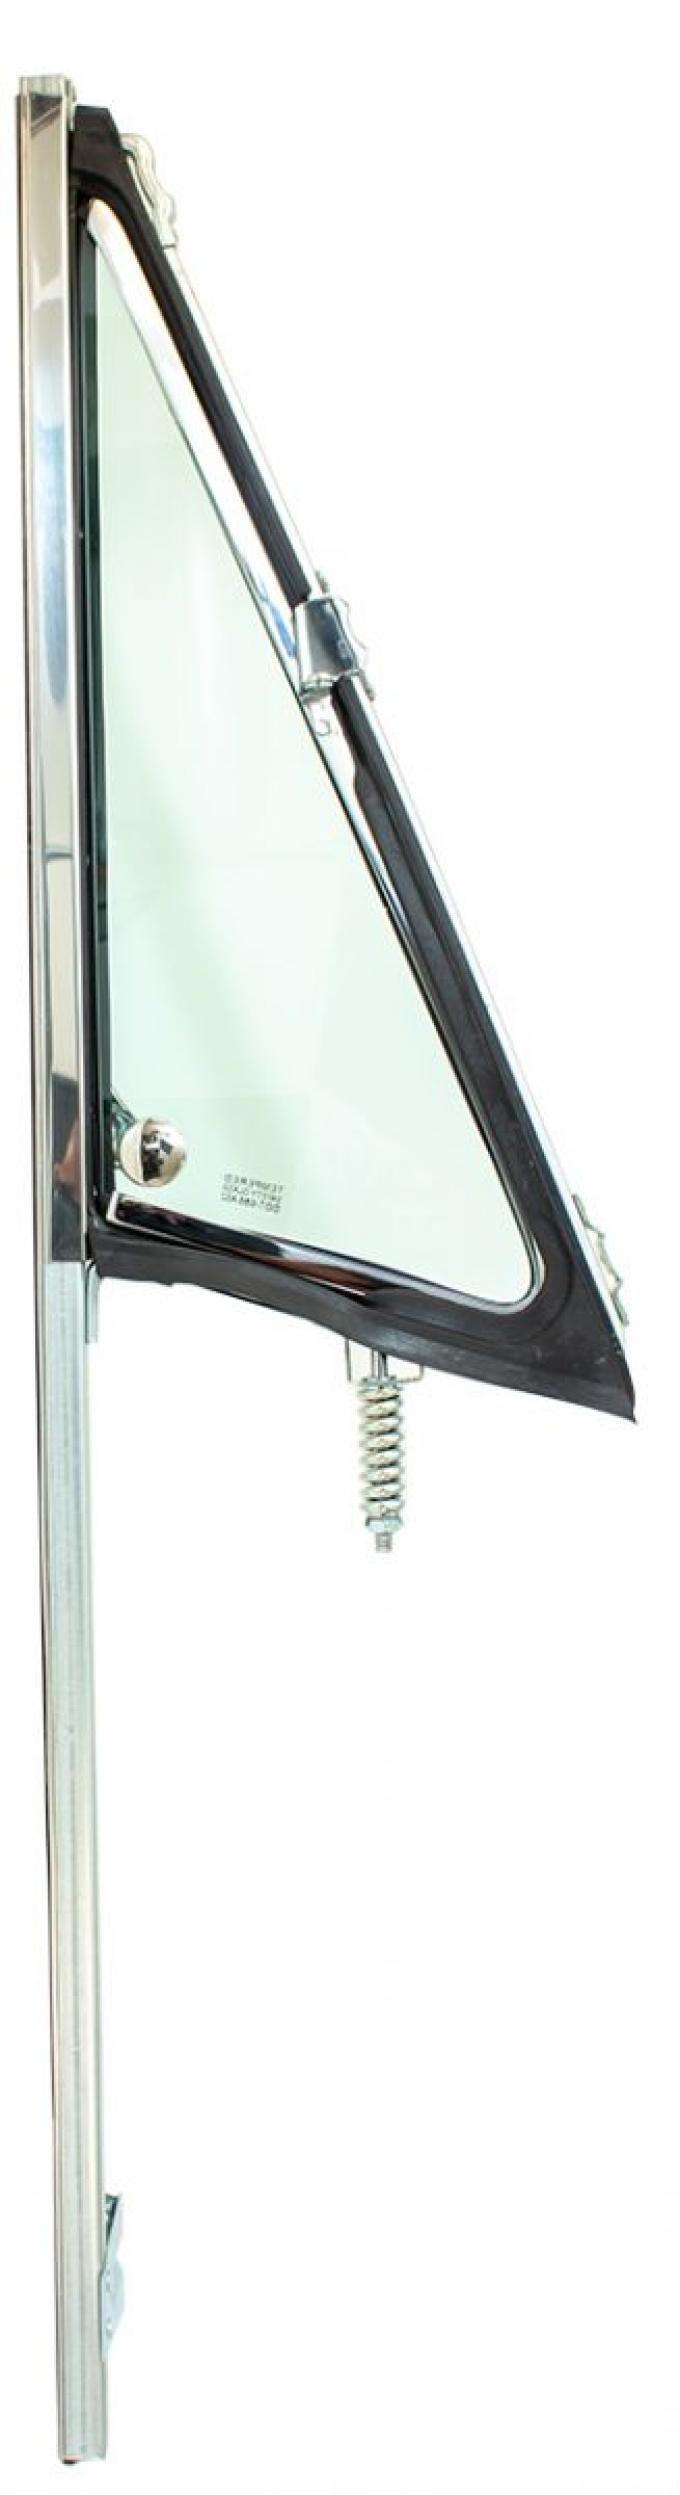 AMD Vent Glass Assembly, Green Tint, RH, 68-72 Chevy GMC Truck Suburban; 69-72 Blazer; 70-72 Jimmy 560-4068-1TR